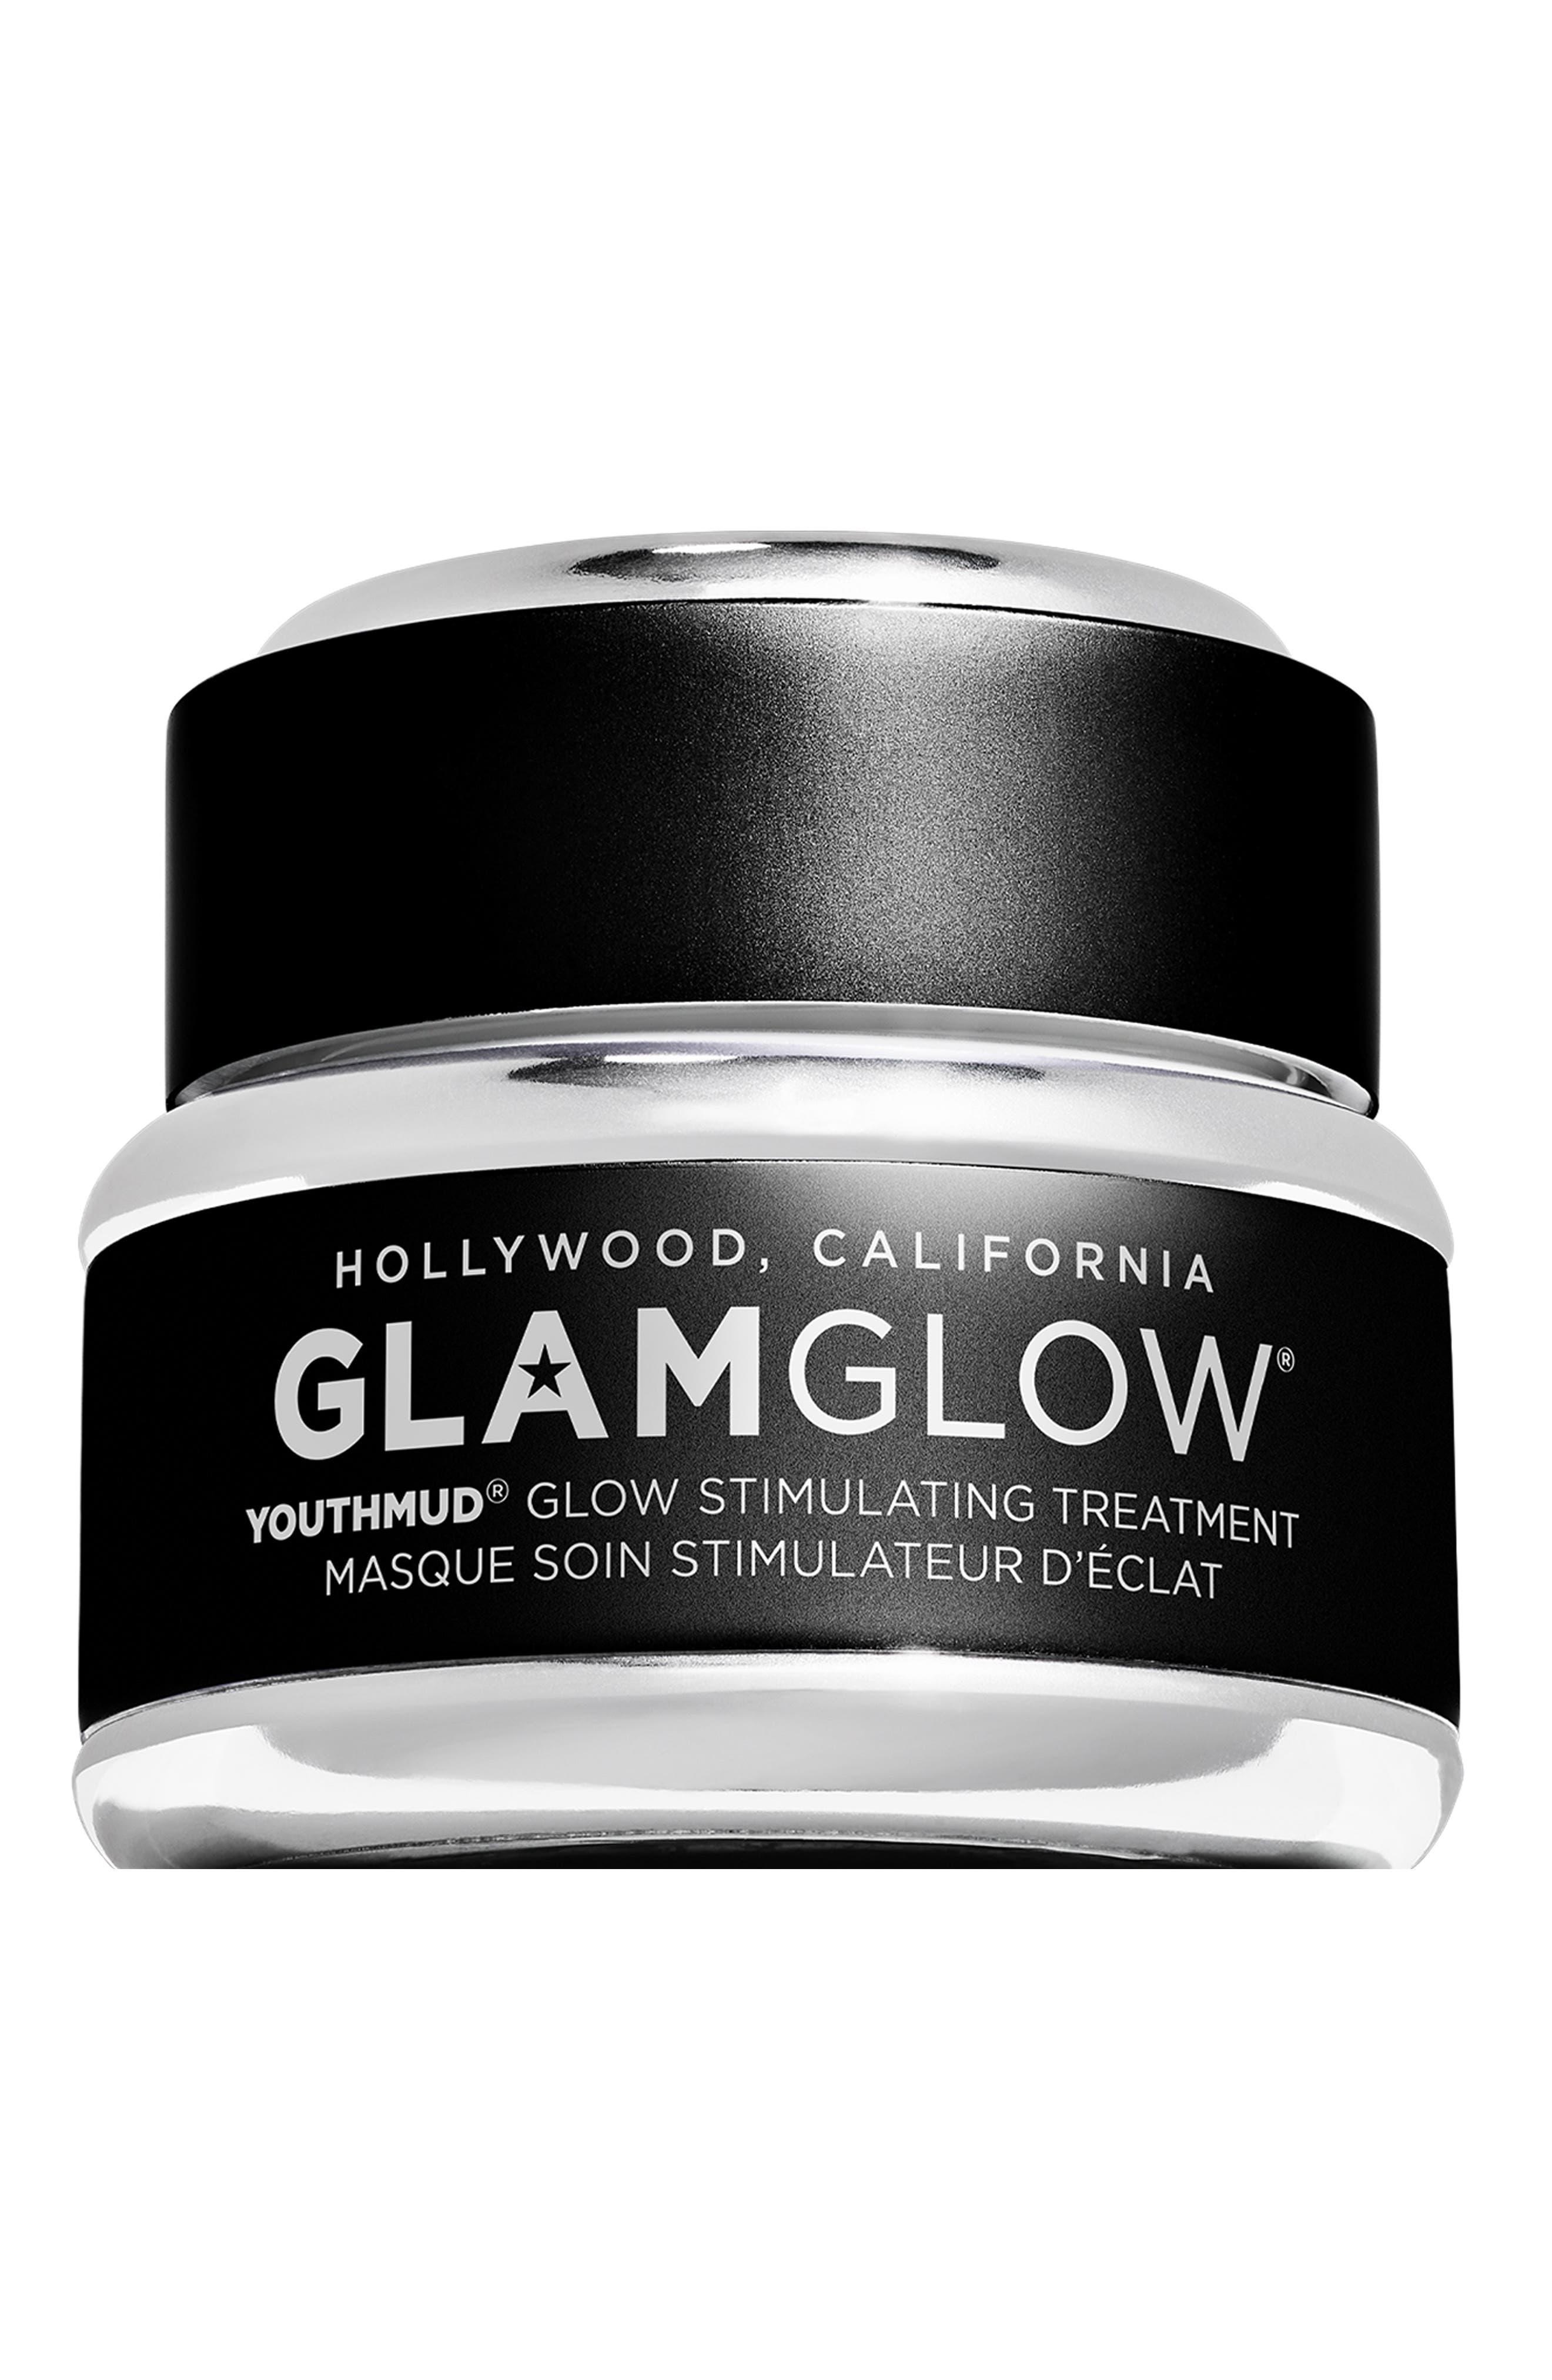 Glamglow Youthmud Glow Stimulating Treatment Mask